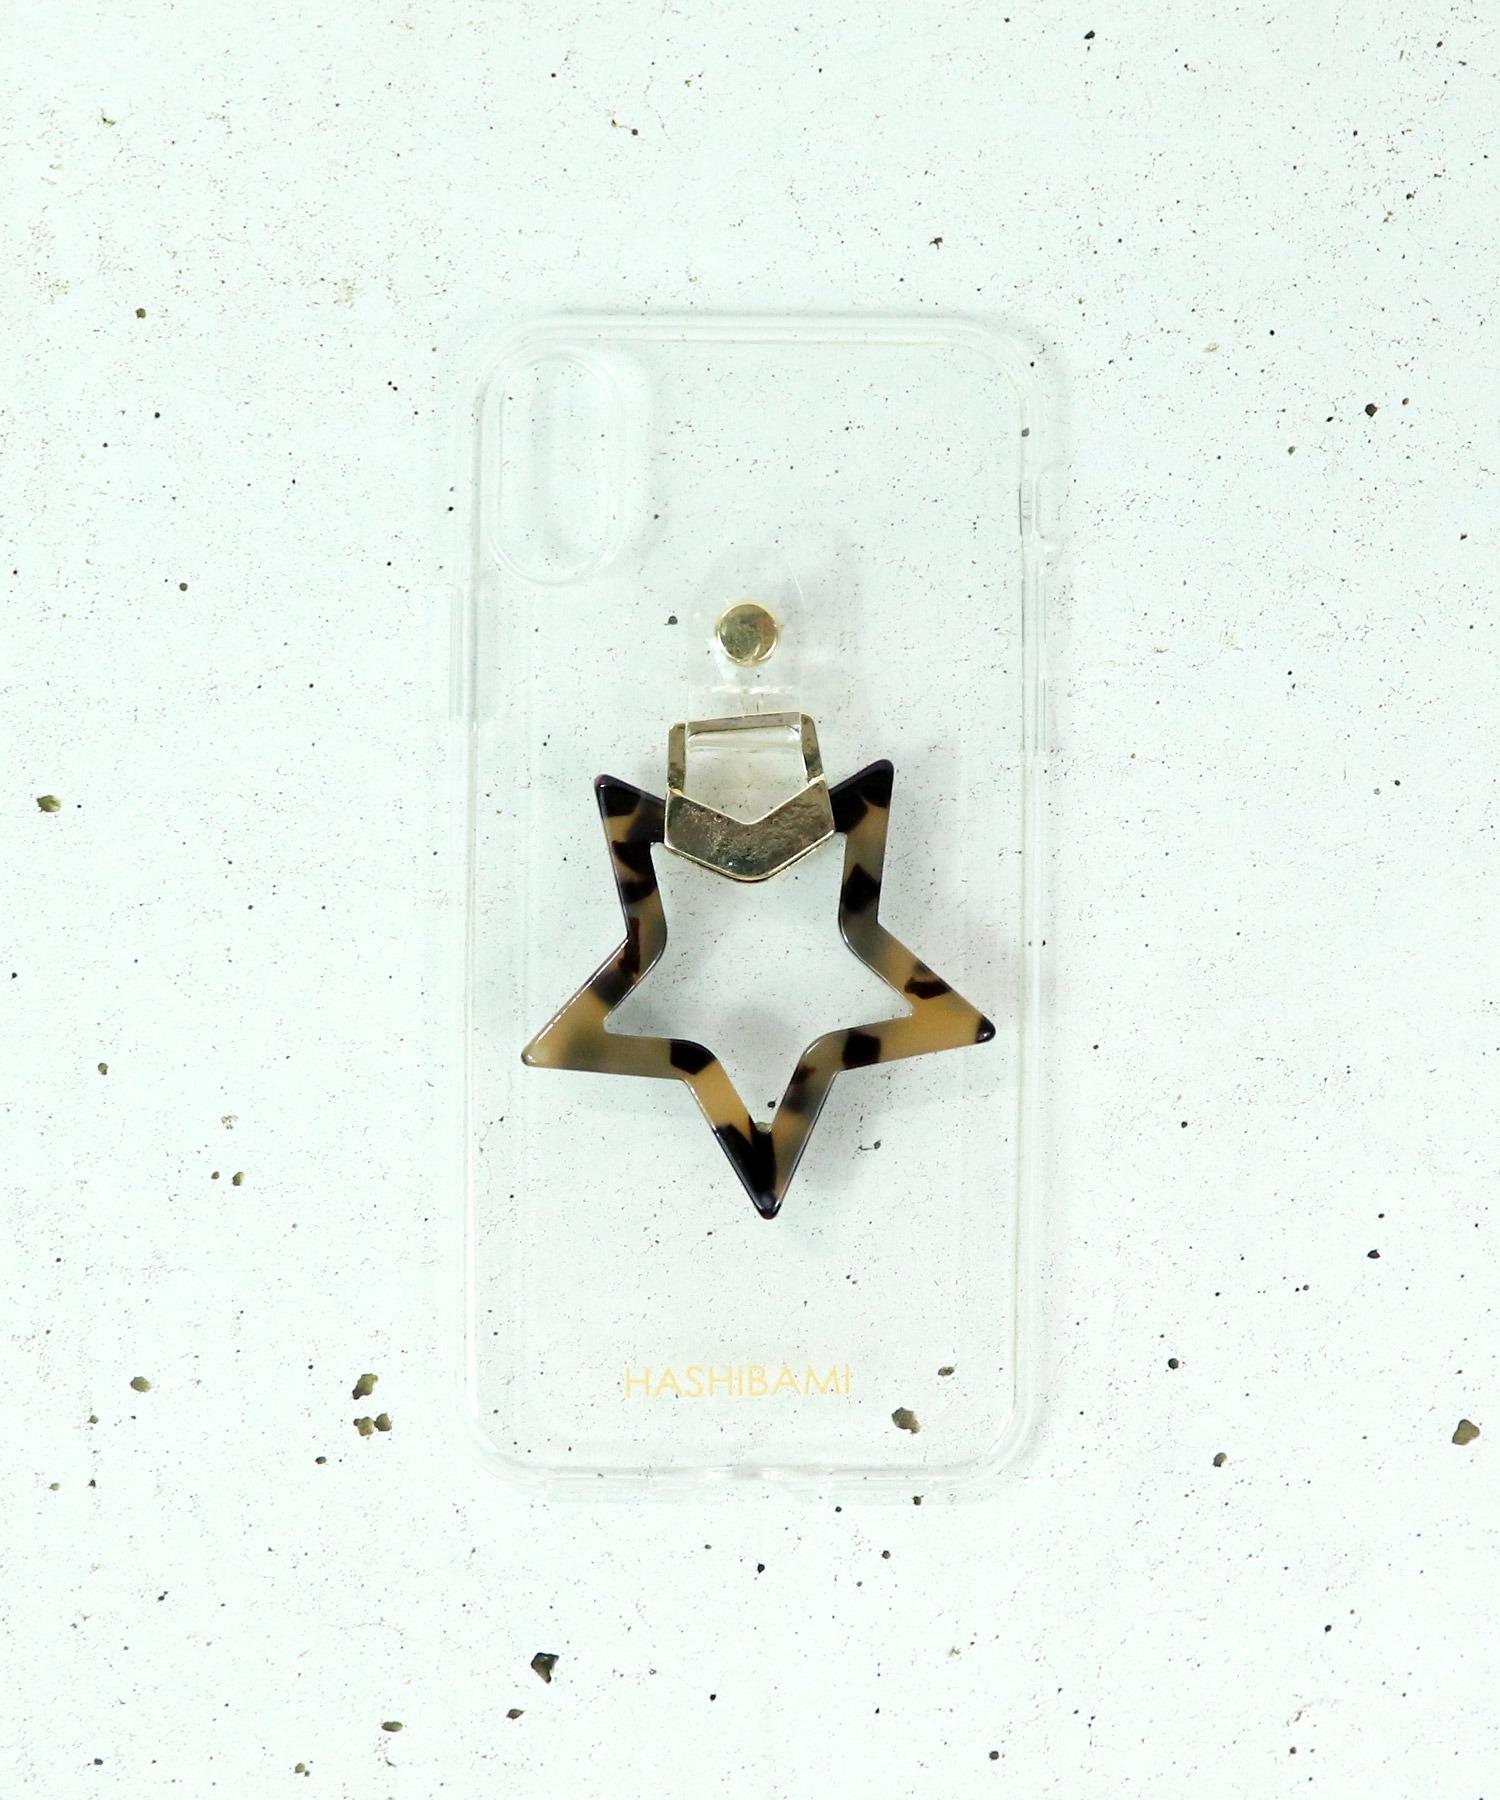 【 Hashibami / ハシバミ 】 # salle de bal別注 iPhone X/XS スマホ・携帯カバー リング付きケース